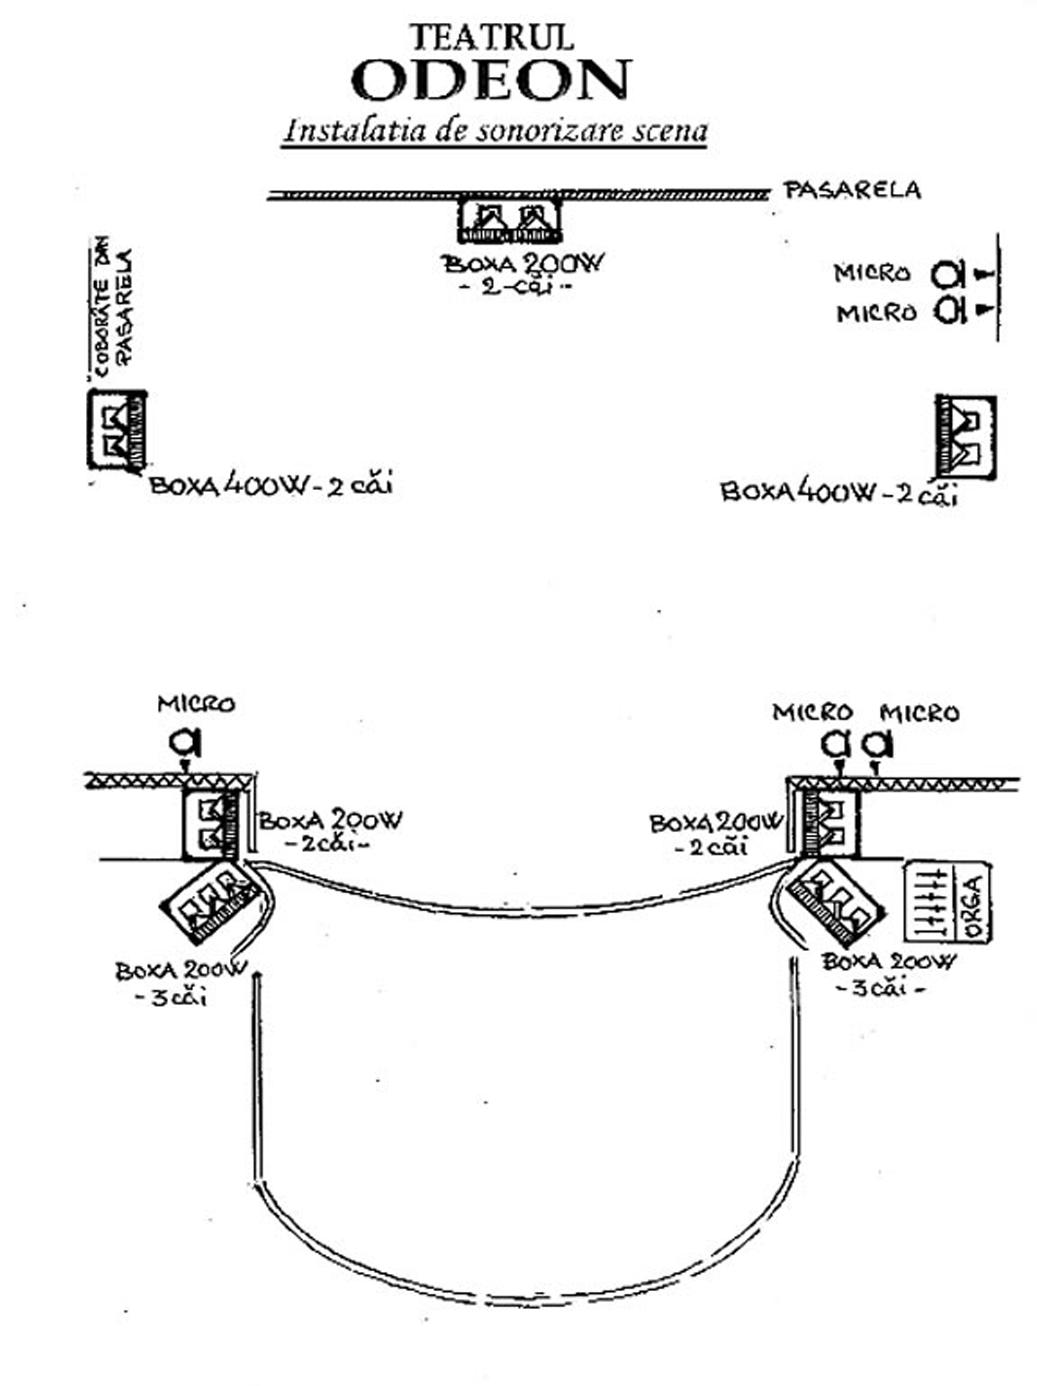 Sala Majestic - plan sonorizare